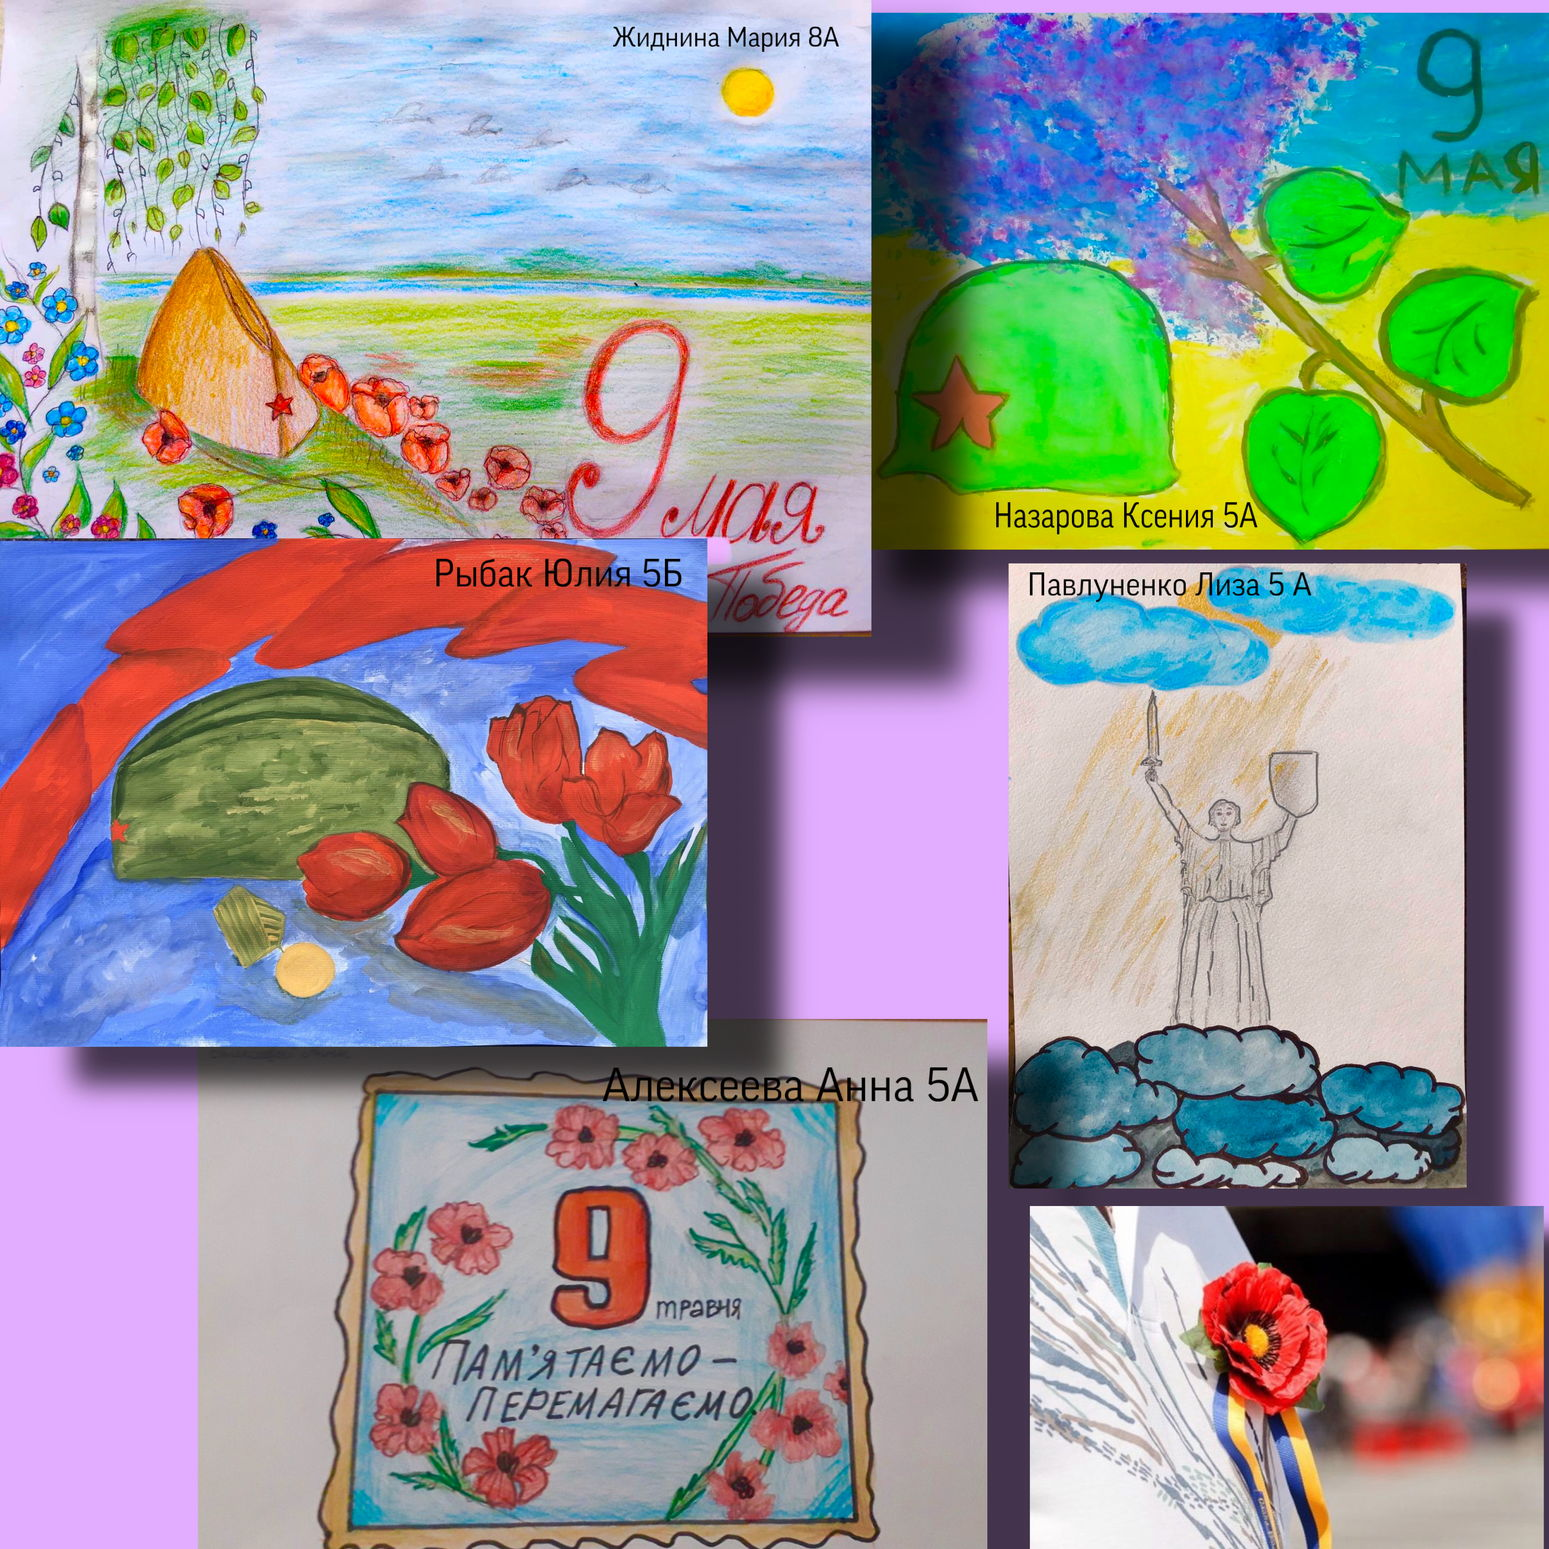 http://kharkivschool3.at.ua/novs/2019-2020/05/imgonline-com-ua-Compressed-T5g5QiCp5rk.jpg